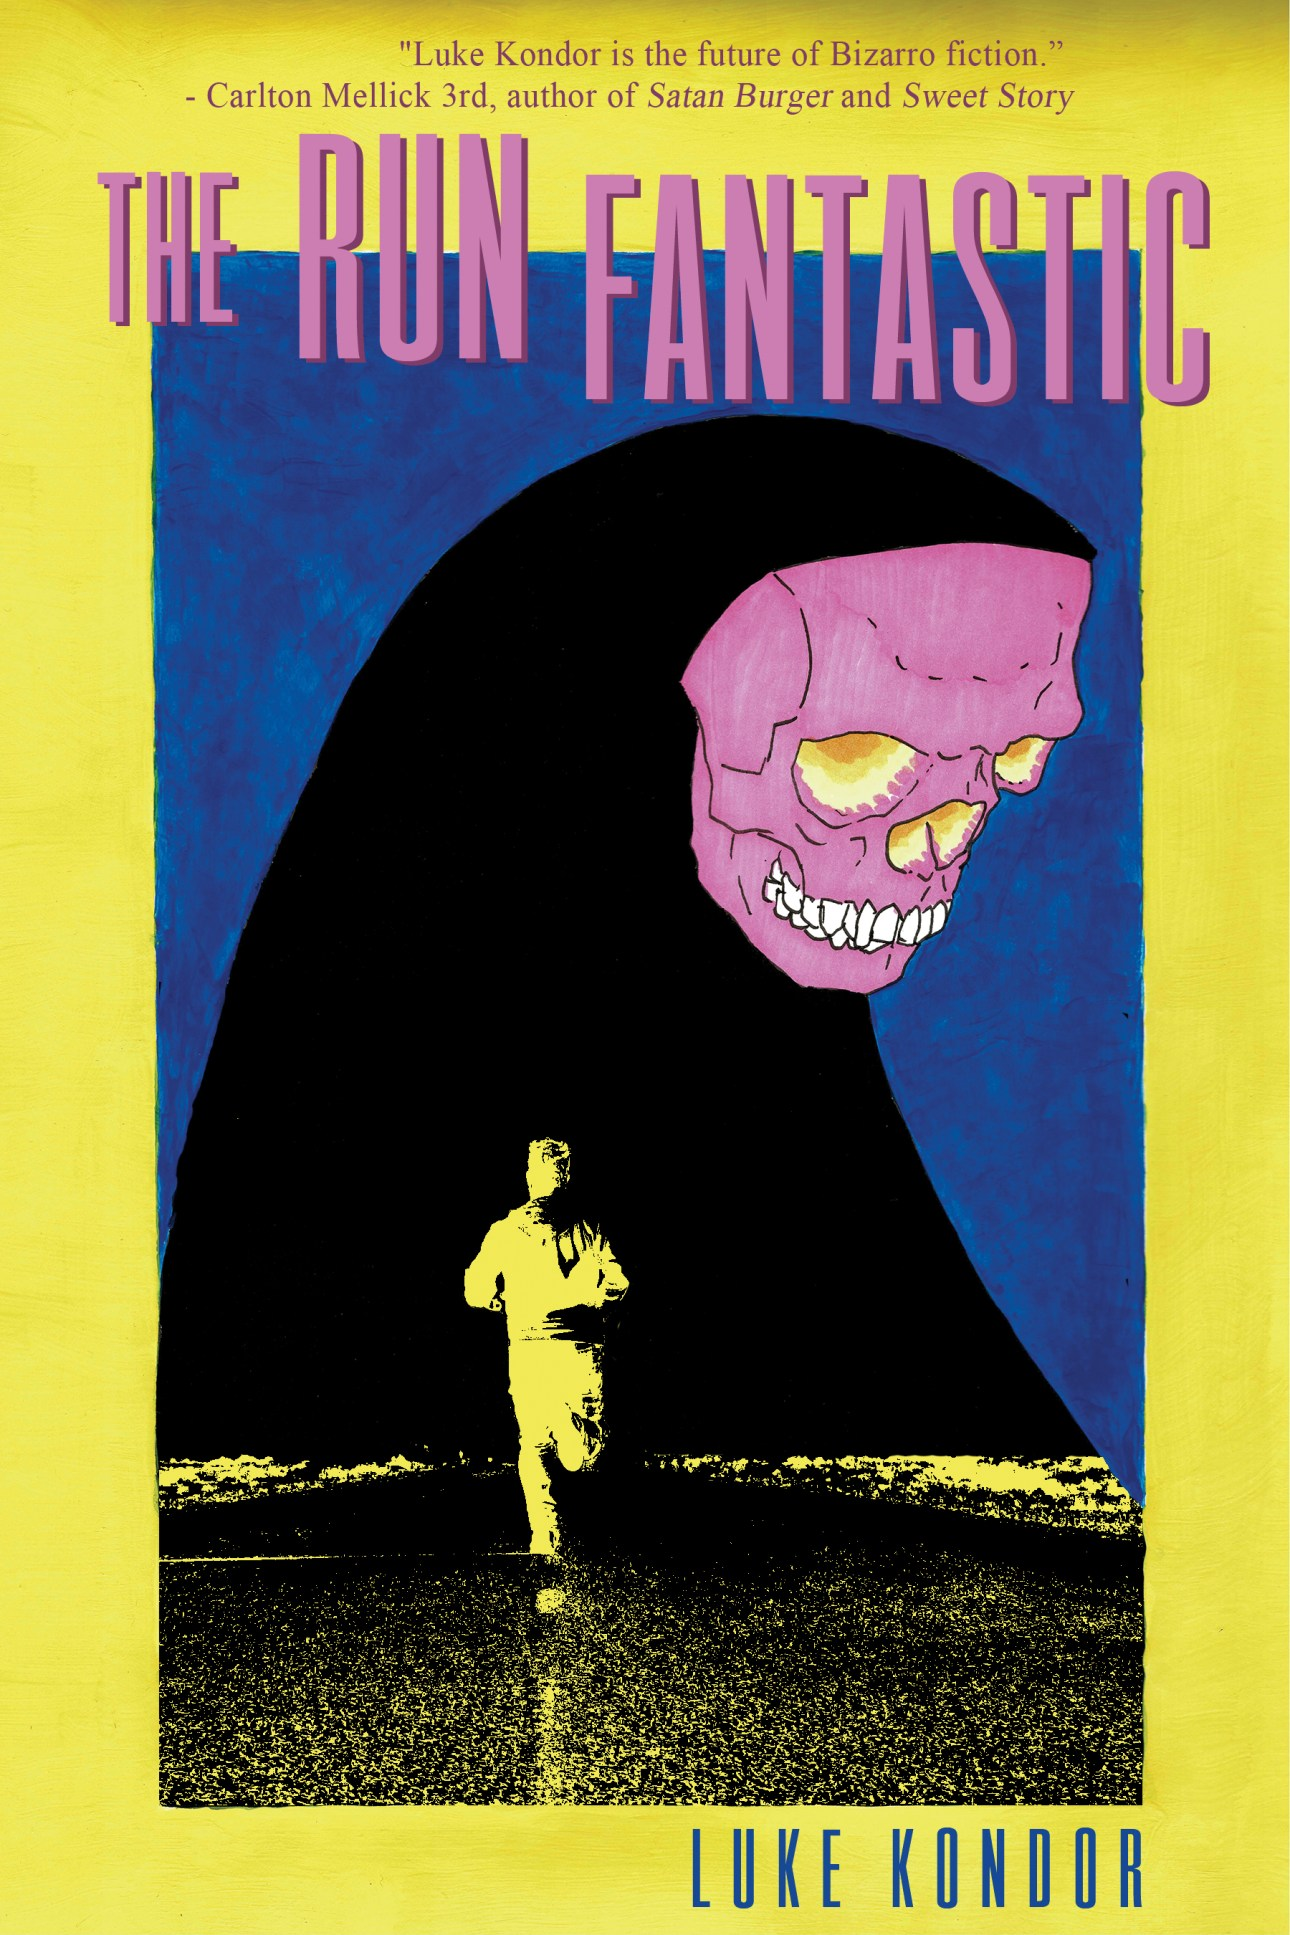 The Run Fantastic cover